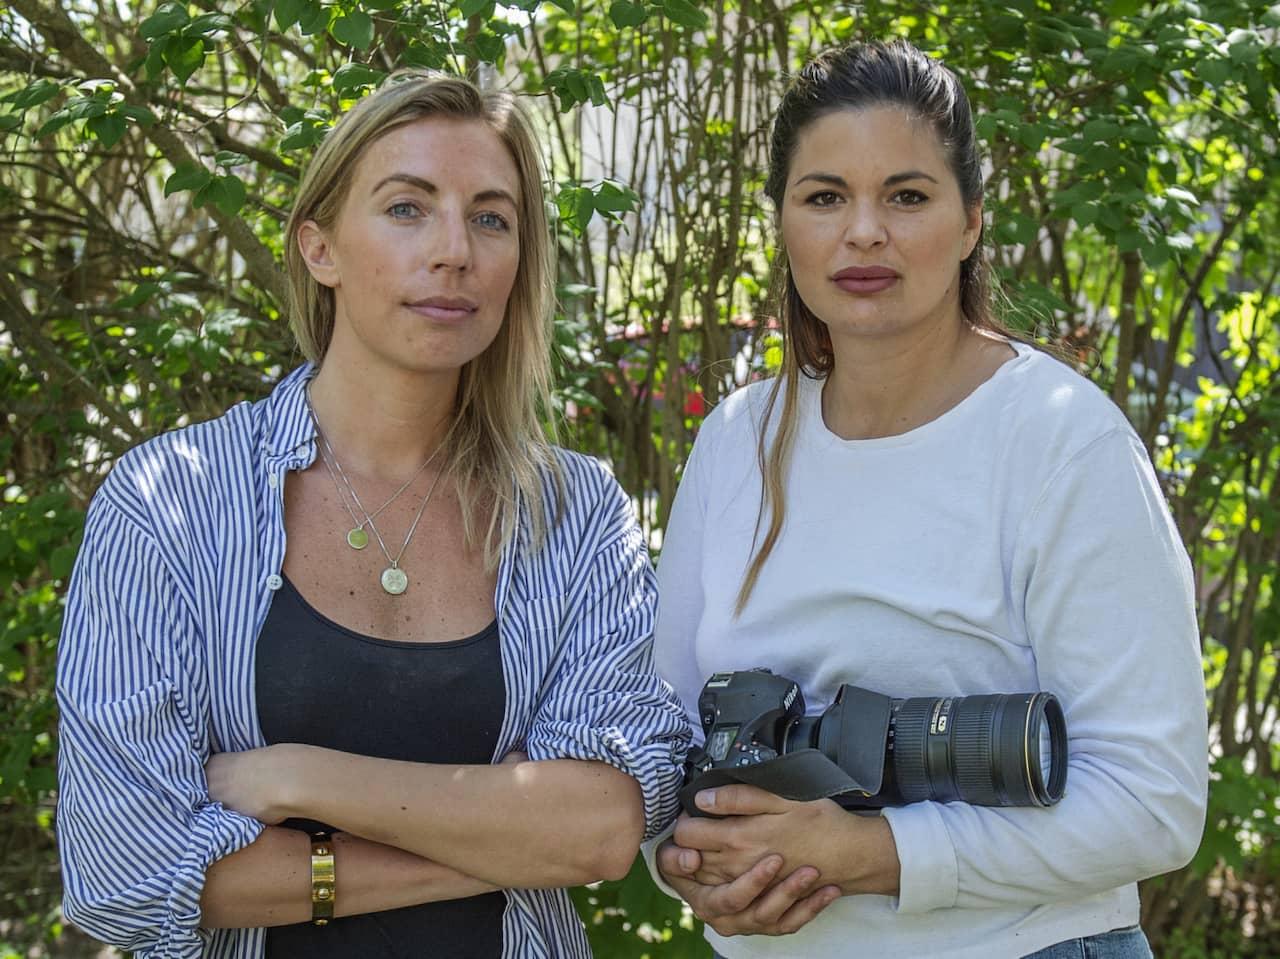 Karolina Skoglund & Anna-Karin Nilsson